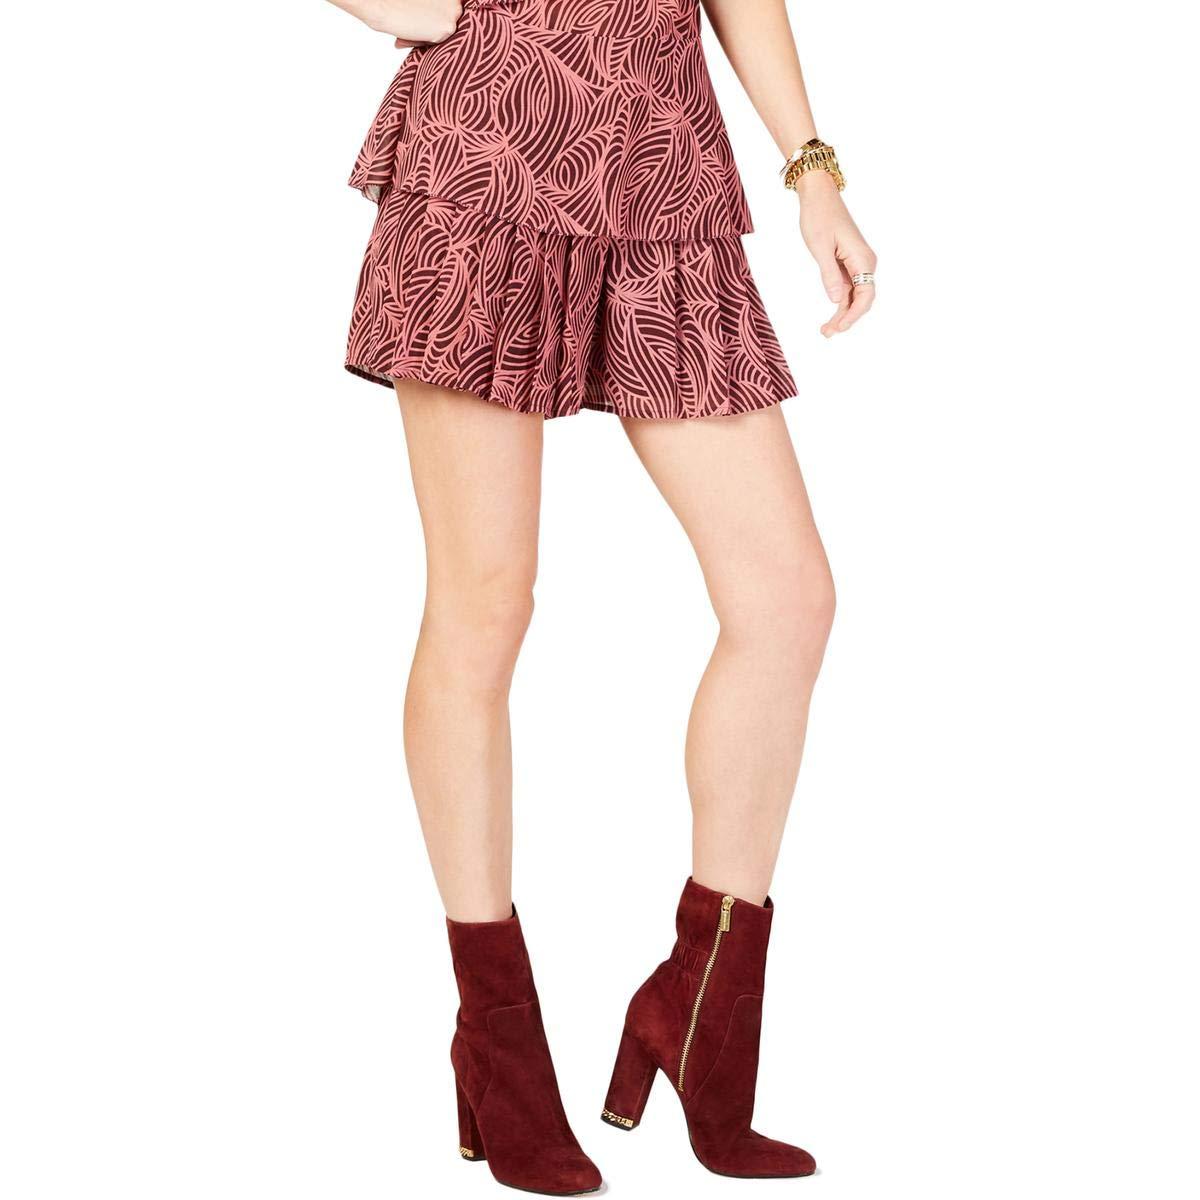 Michael Michael Kors Womens Petites Swirl Printed Ruffled Dress Shorts Purple 2P by Michael Michael Kors